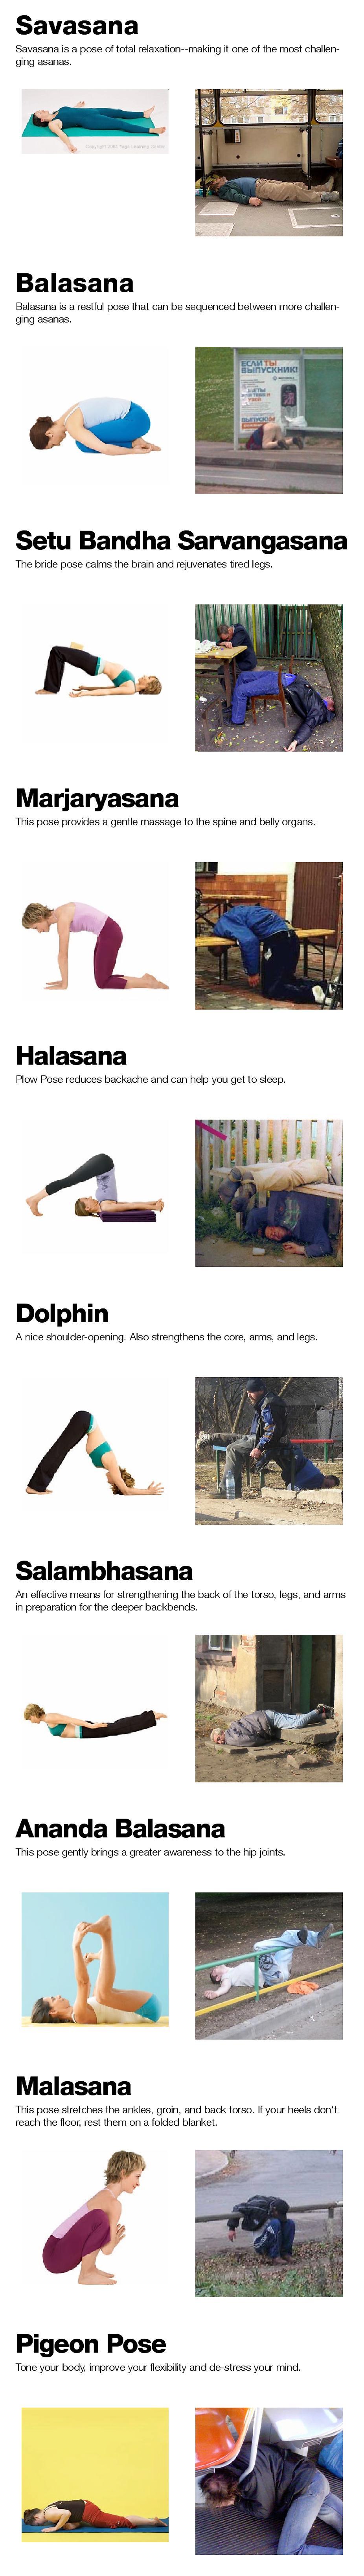 yoga-borracho